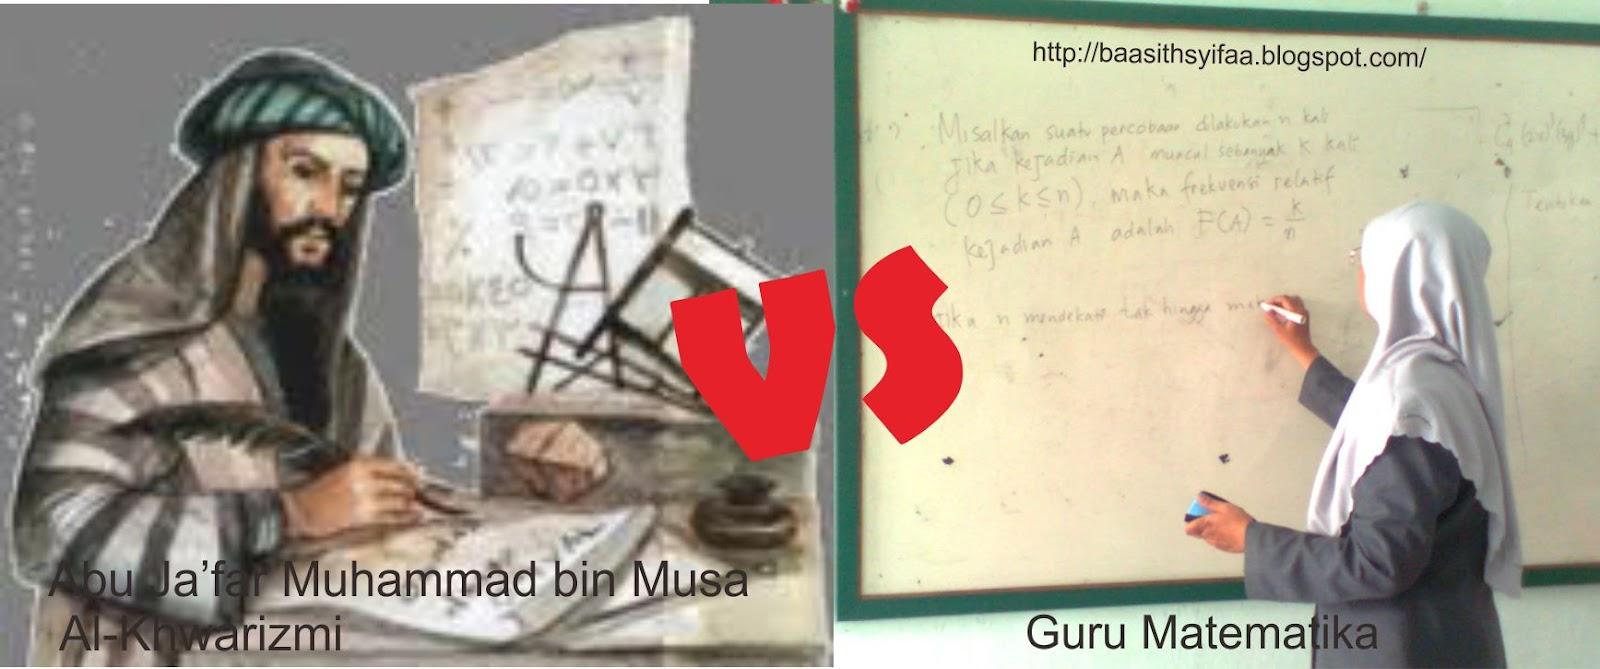 abu ja'far al khwarizmi Int j pathol 2015 13(3): 87-88 87 history of science abu ja`far muhammad bin musa al-khawarizmi founding father of algebra (780-850) compiled by anwar ul haque.